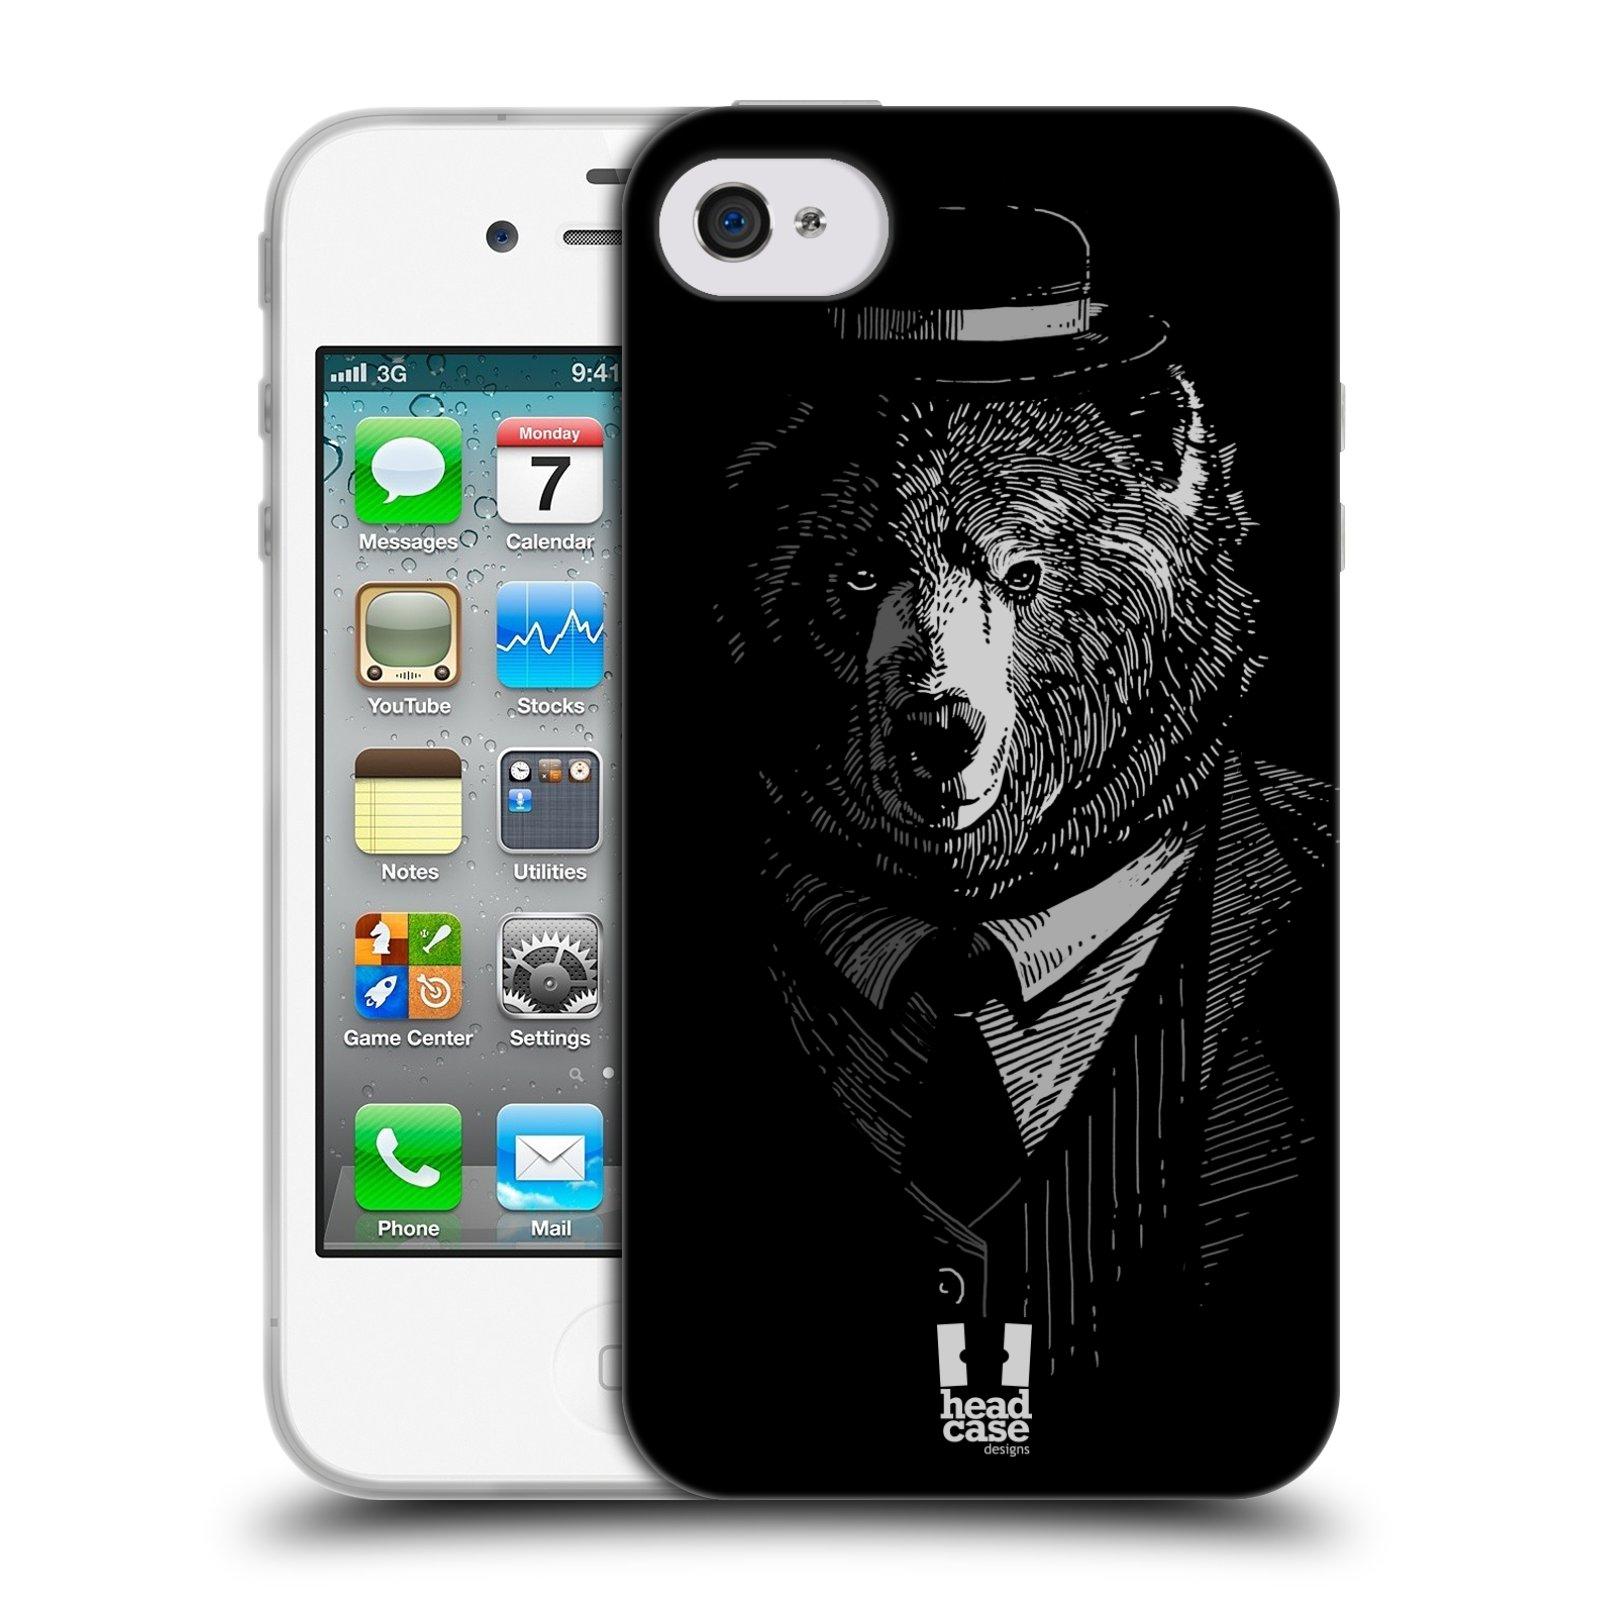 HEAD CASE silikonový obal na mobil Apple Iphone 4/4S vzor Zvíře v obleku medvěd